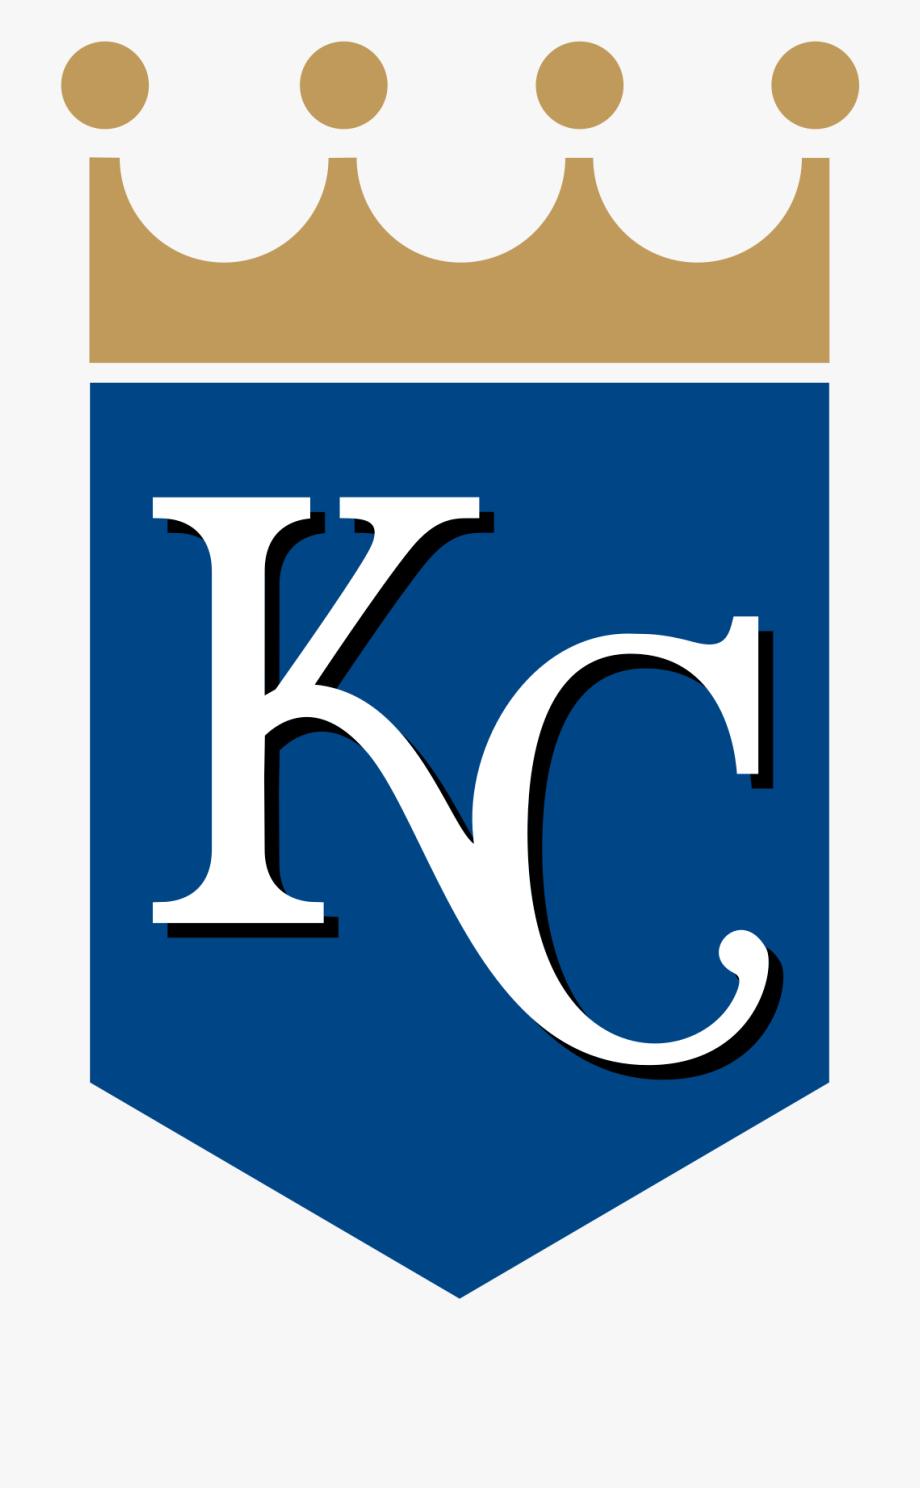 Royals logo clipart jpg freeuse download Kansas City Crown Logo Graphic Royalty Free - Transparent ... jpg freeuse download